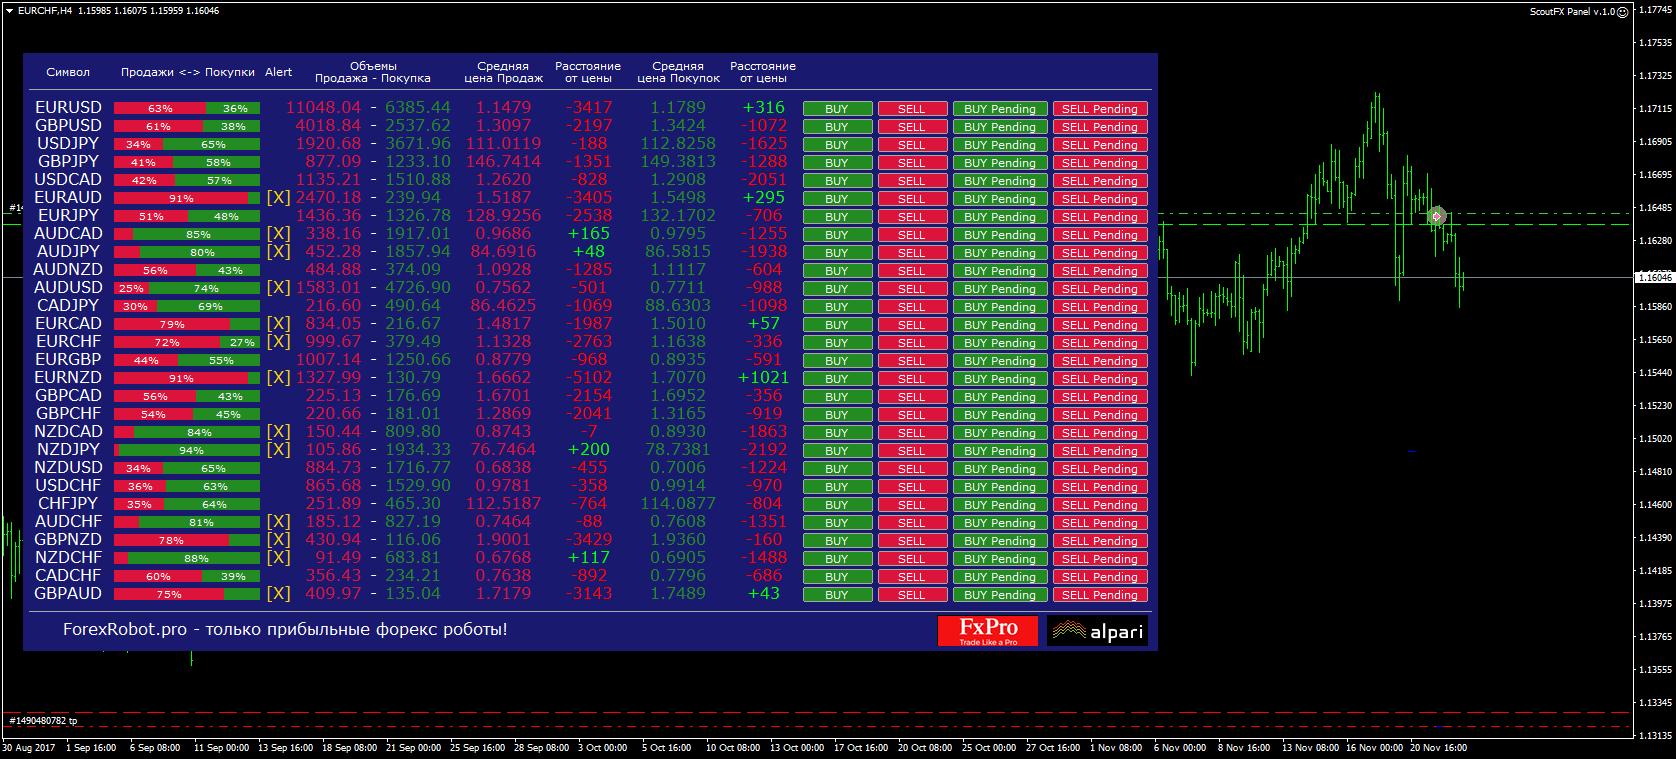 Панель трейдера ScoutFX Panel для Meta Trader 4